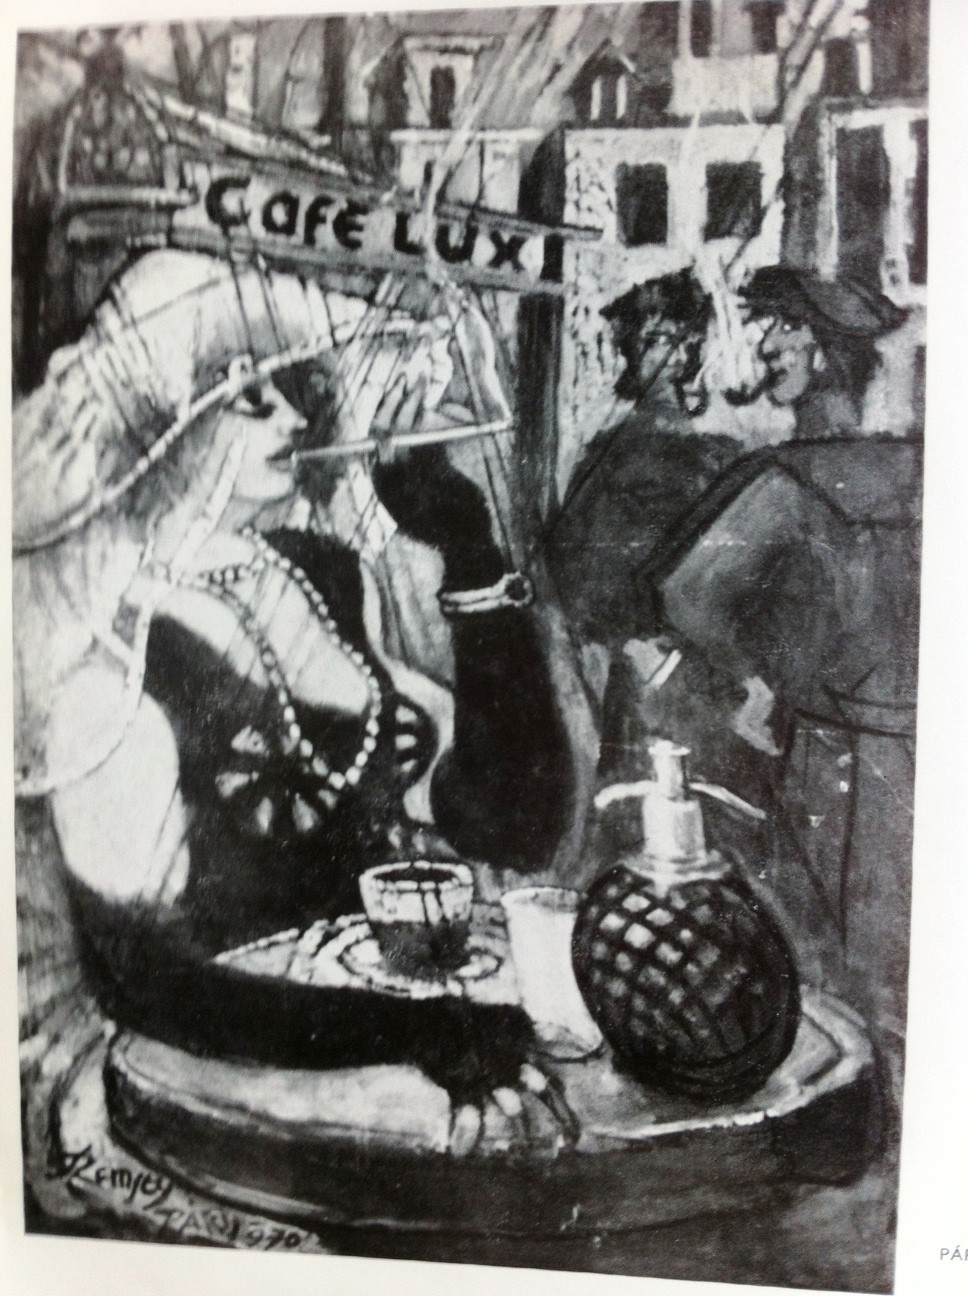 Remsey, Jenő György: Café Lux III